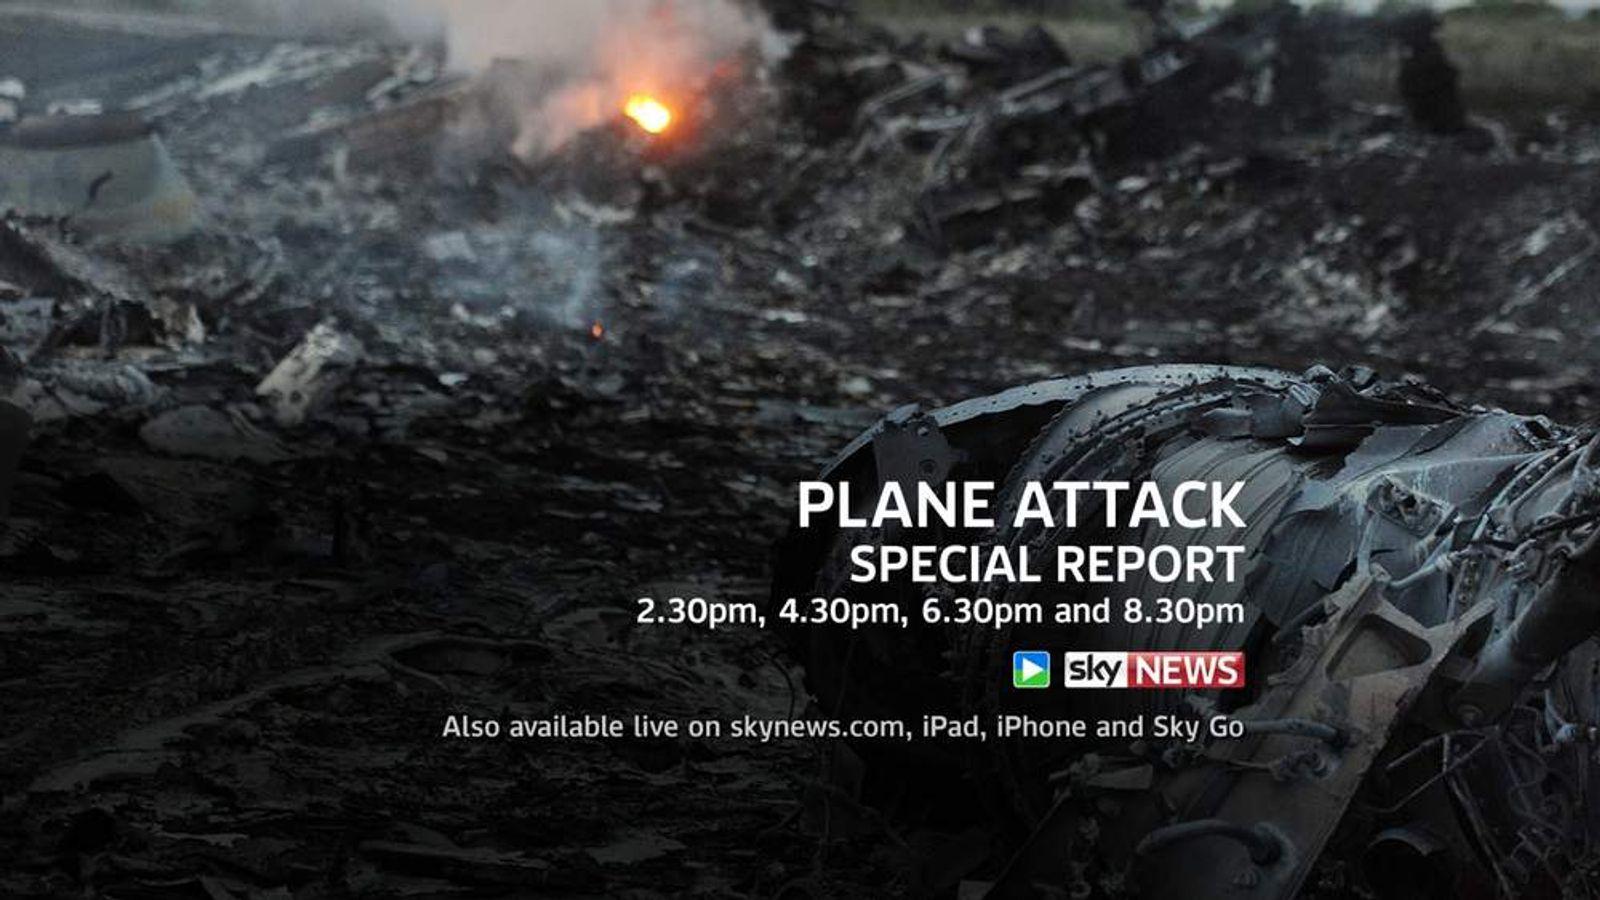 Plane Attack Special Report